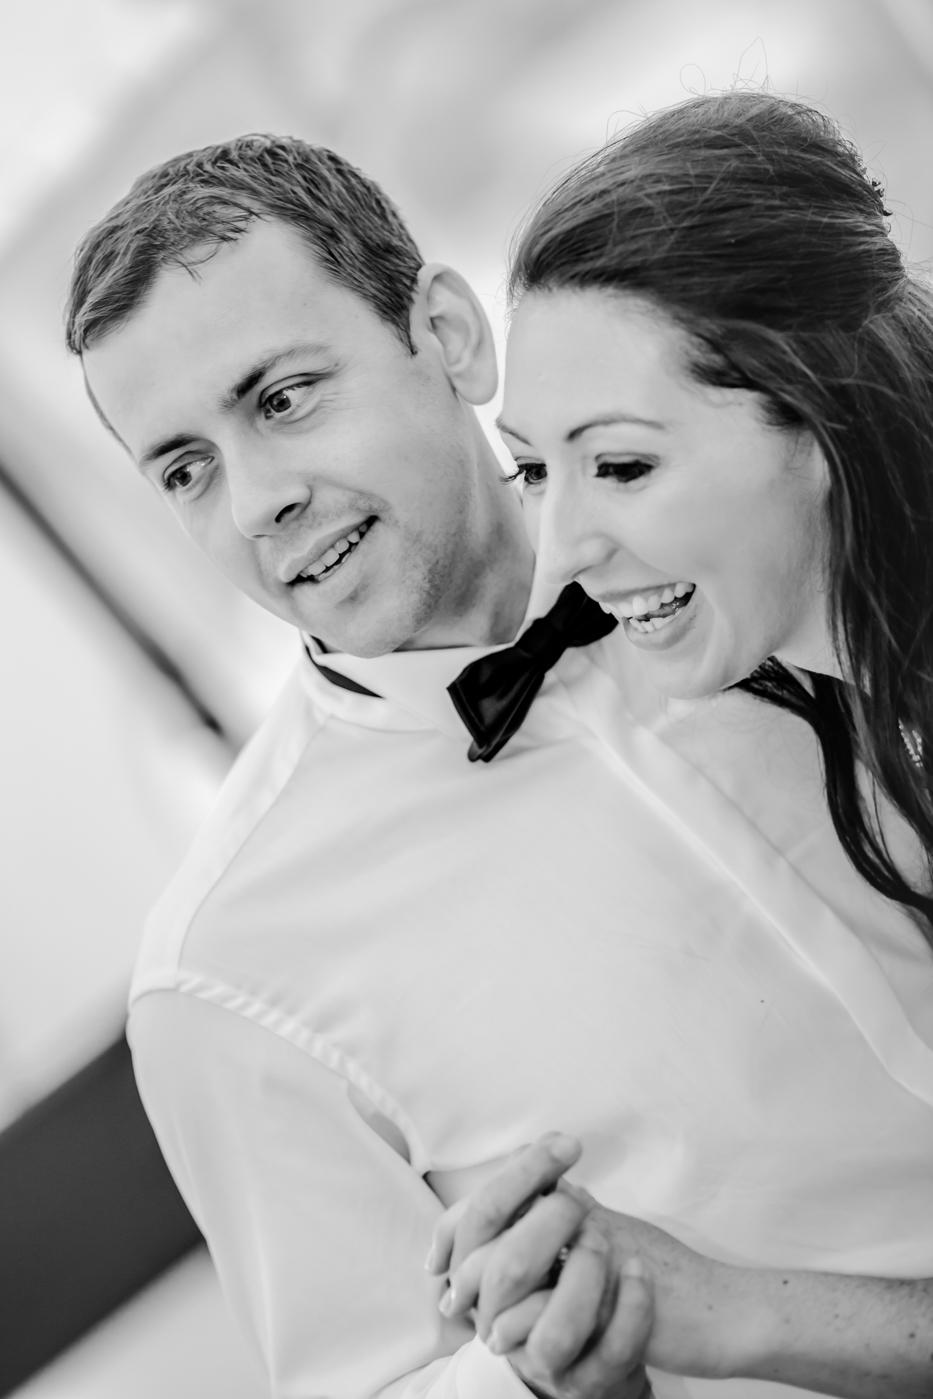 188 - Abi and Chris at Kedleston Hall - Wedding Photography by Mark Pugh www.markpugh.com - 2.JPG